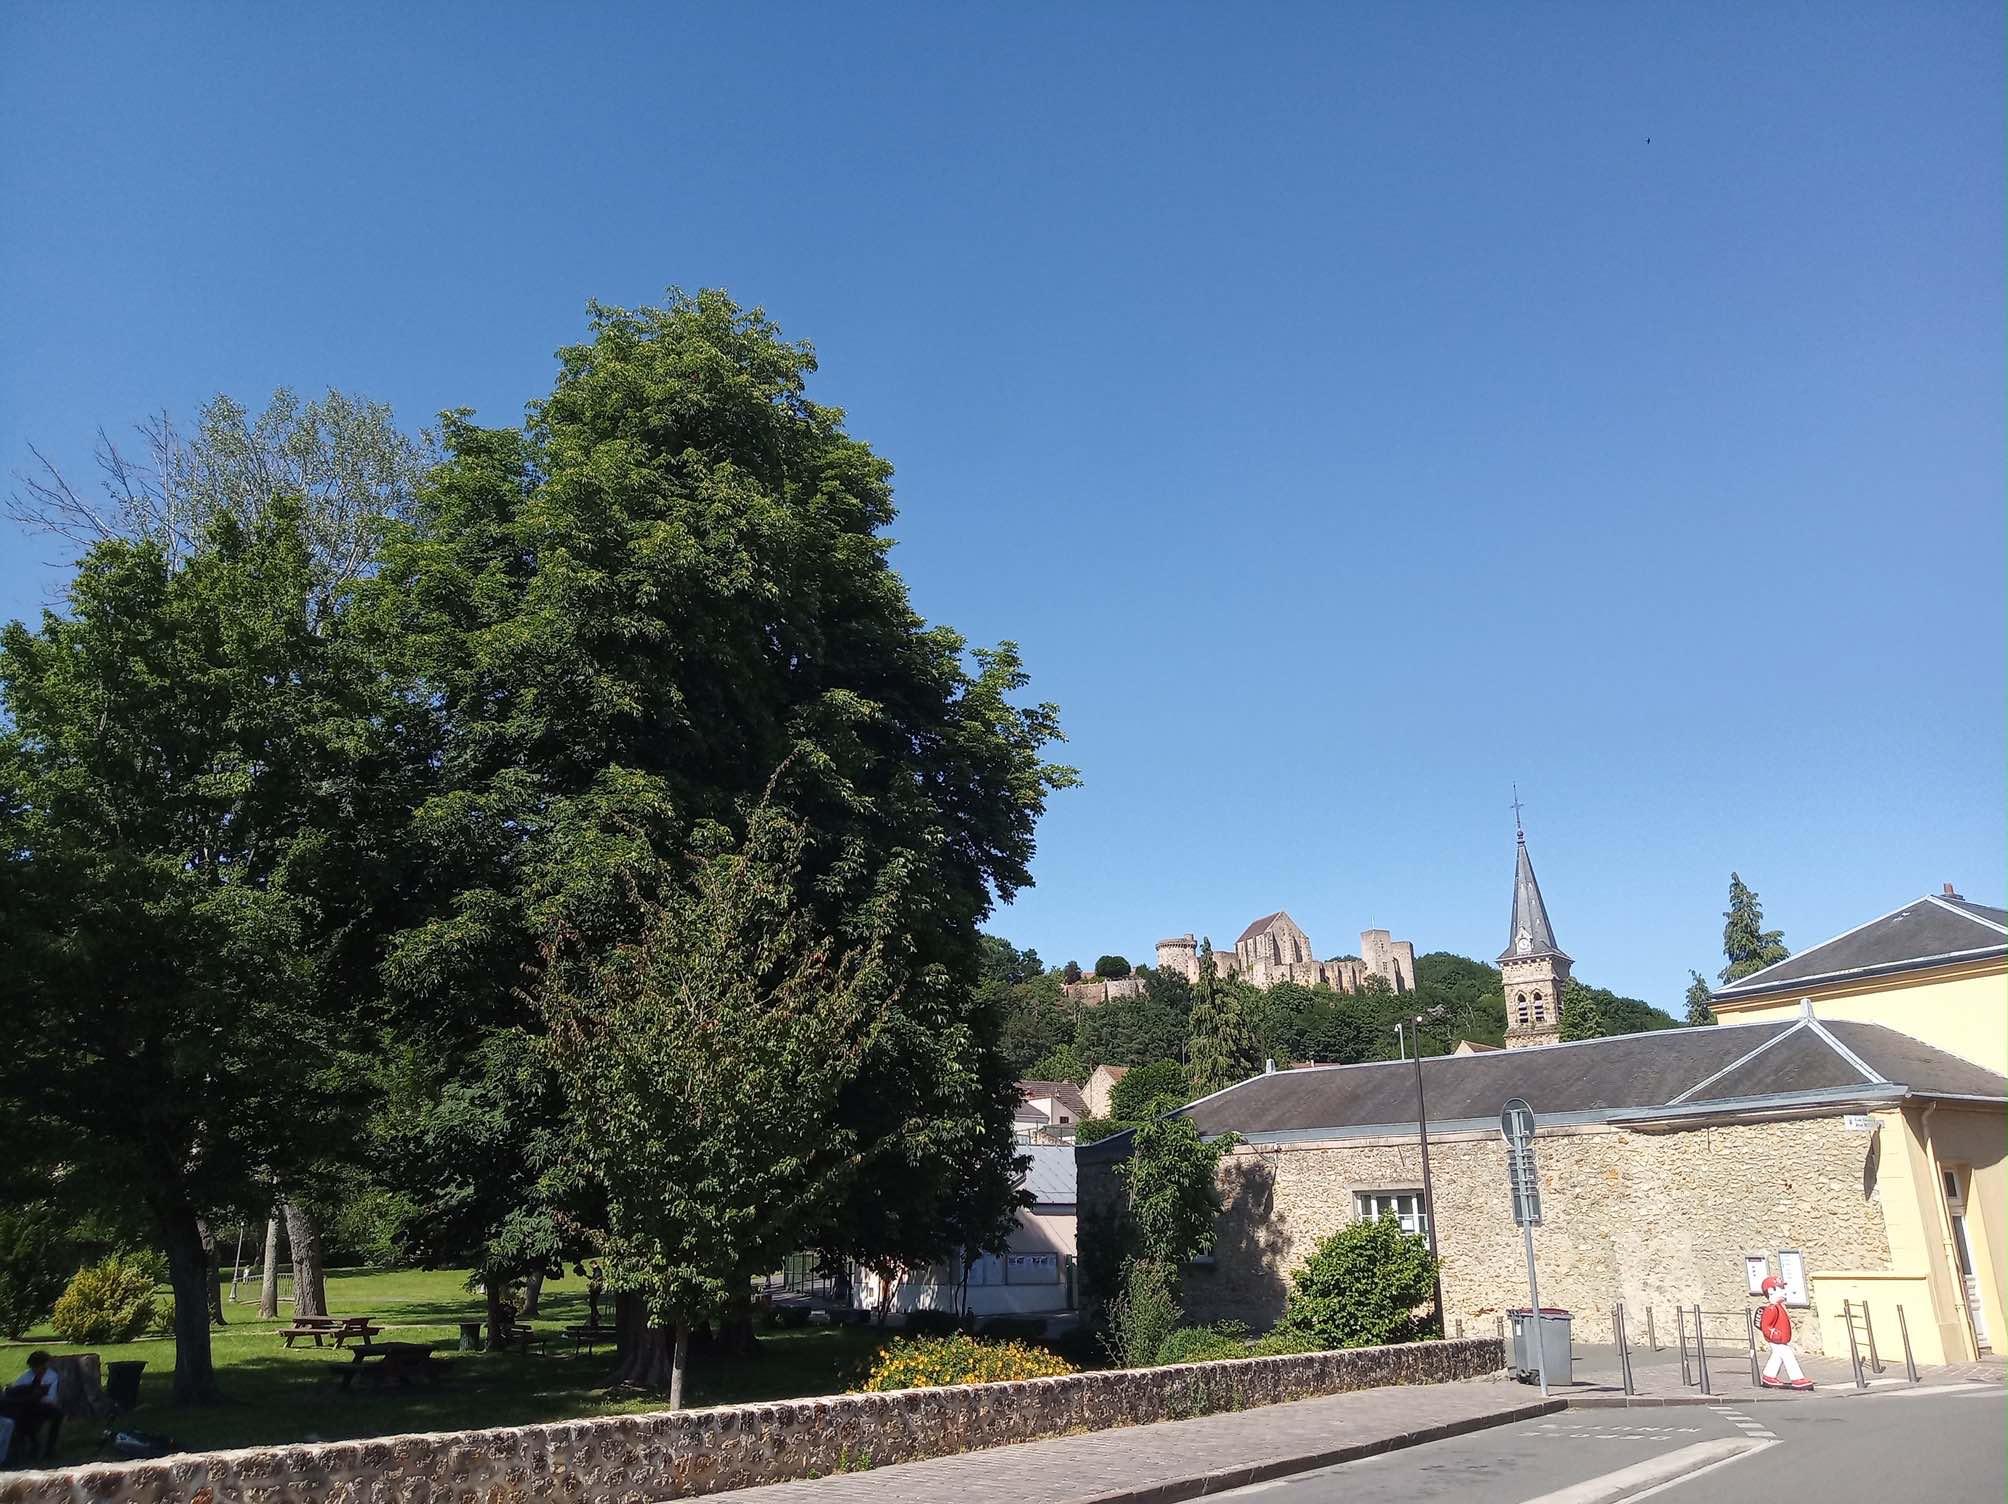 chevreuse, château de la madeleine, vallée de chevreuse